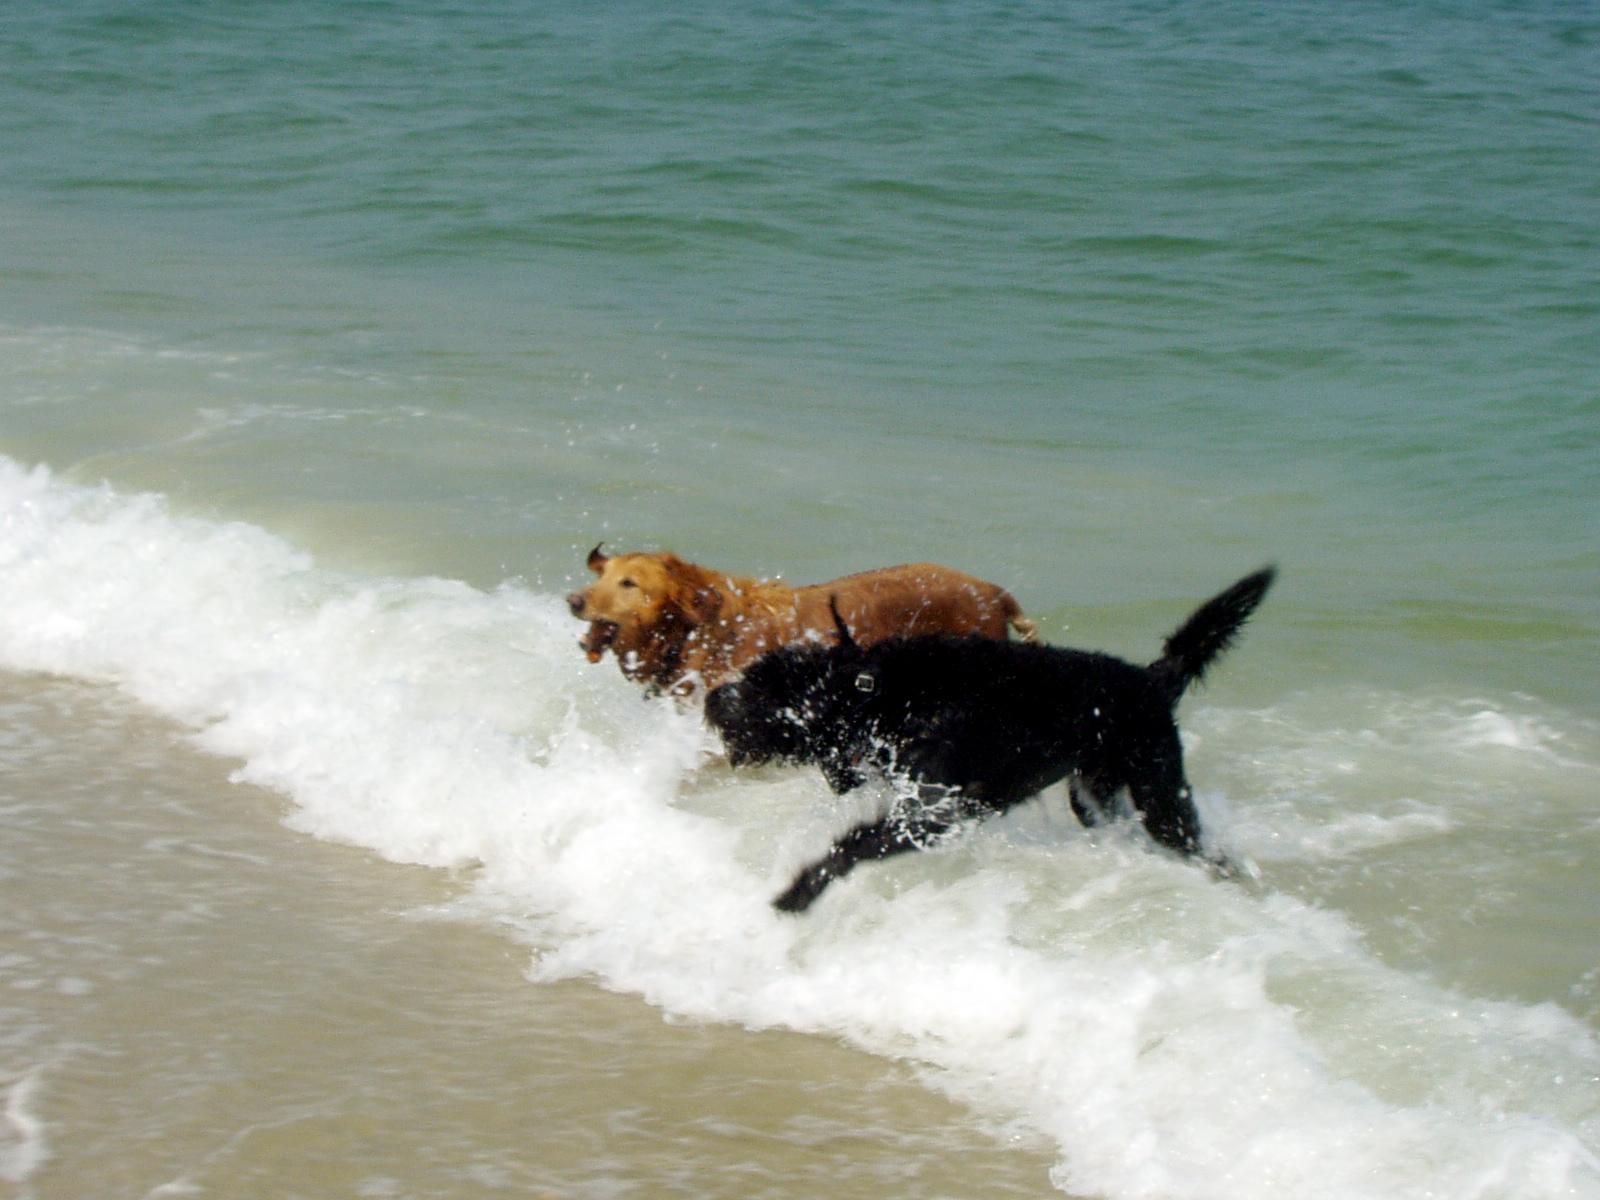 Hikewithyourdog